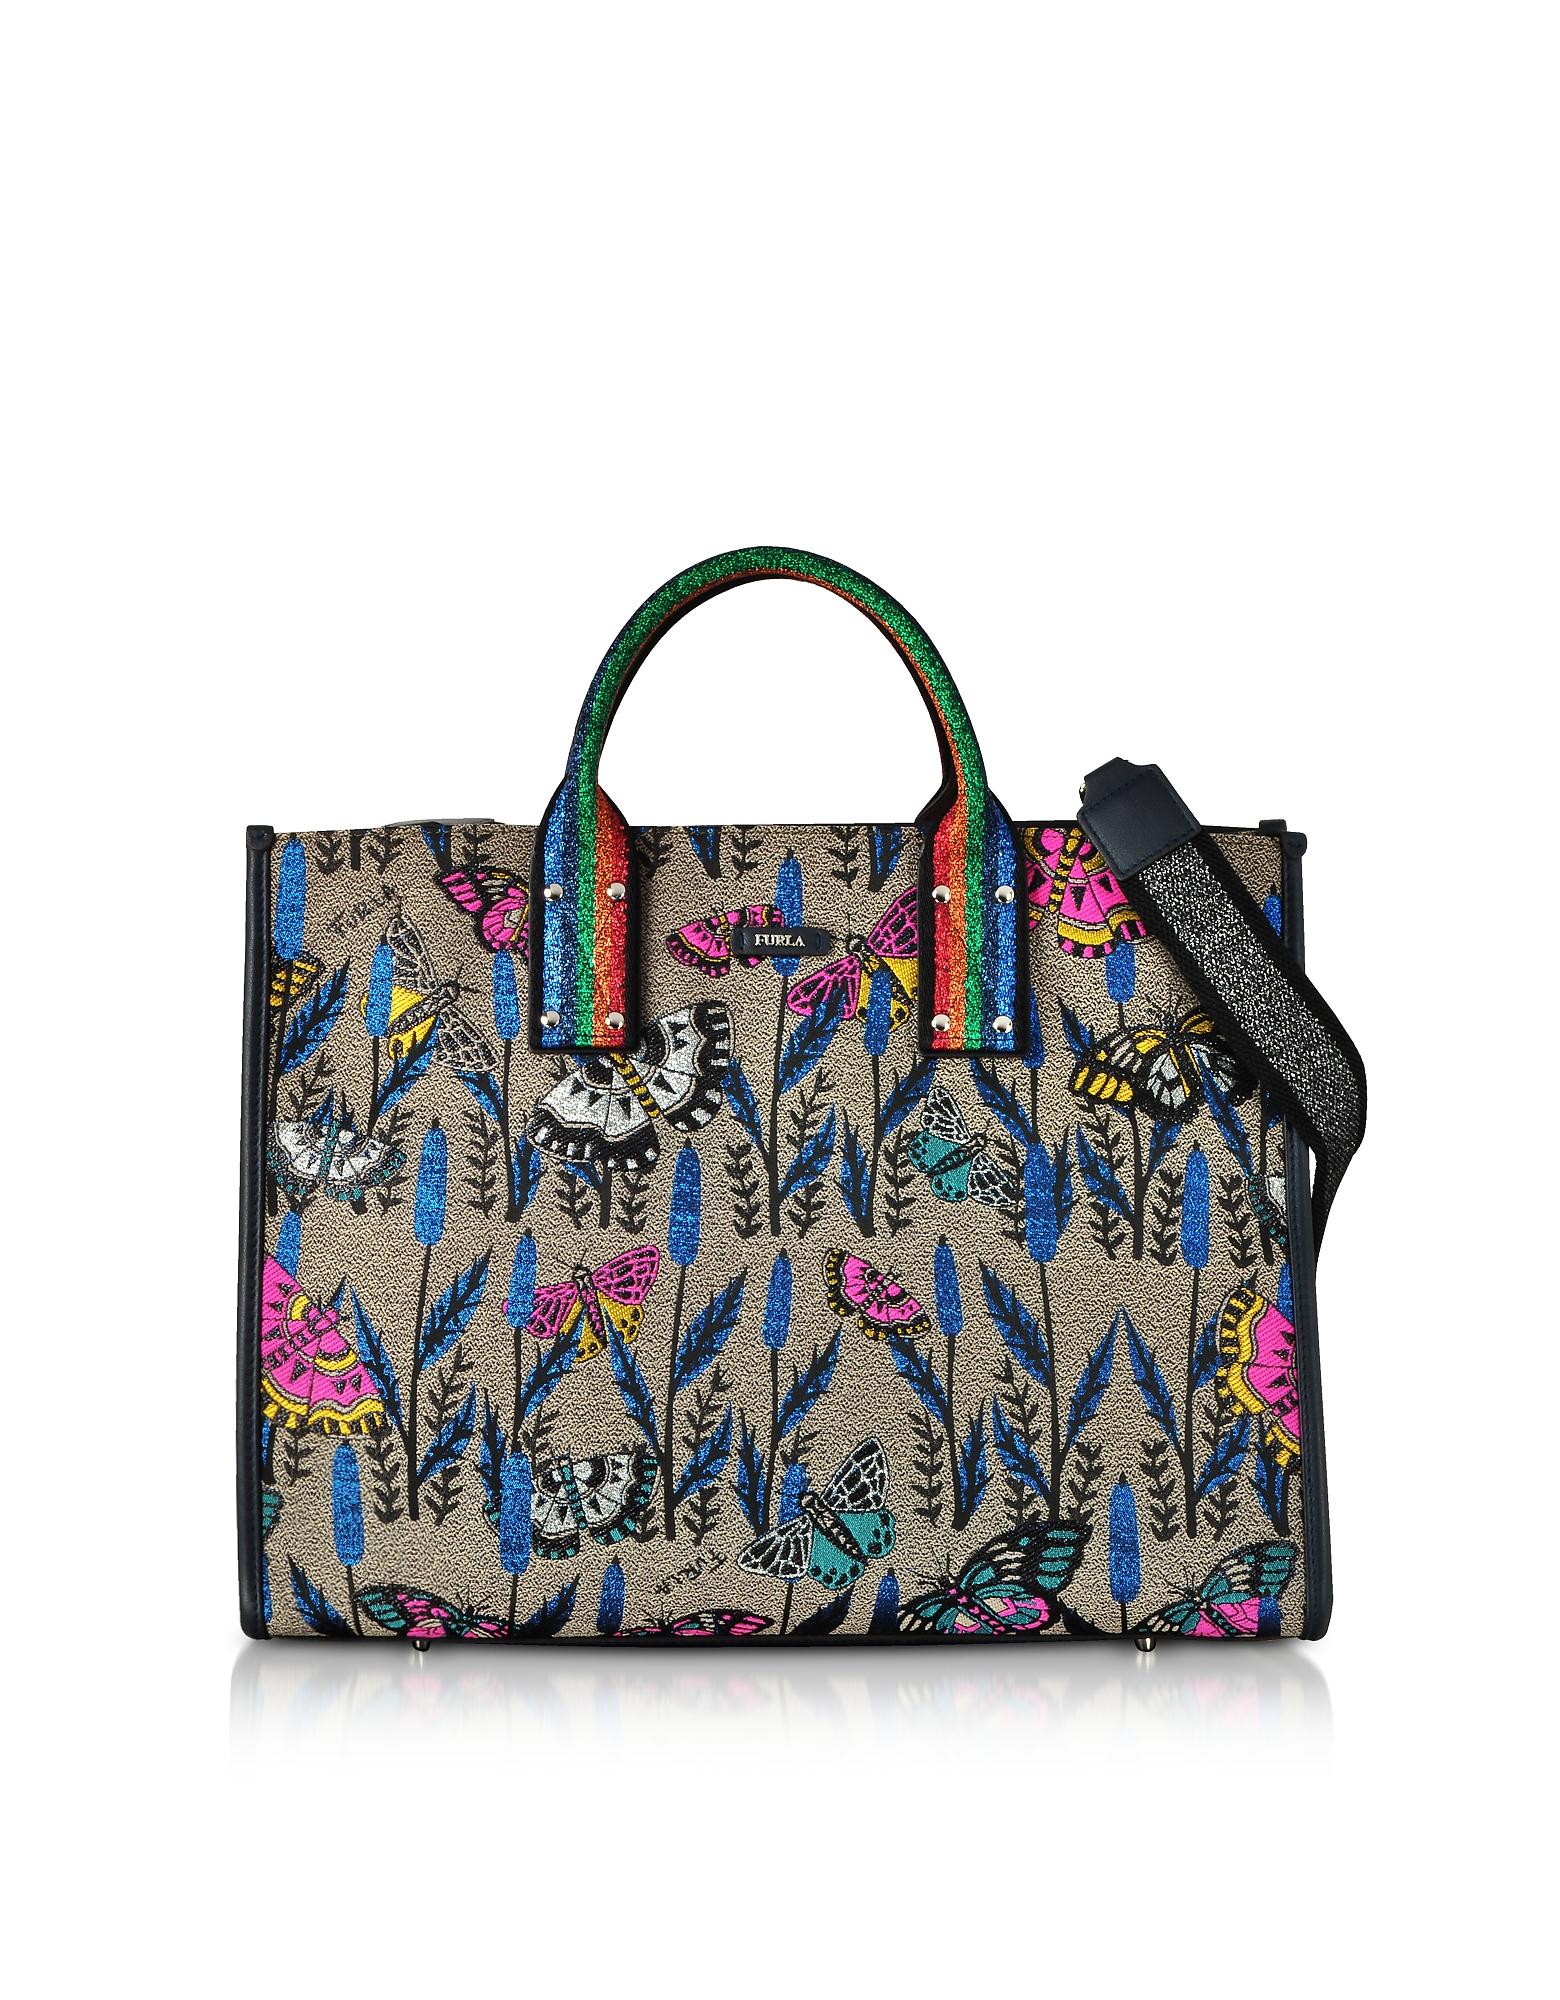 Image of Furla Designer Handbags, Canvas and Lurex Erica Large Tote Bag